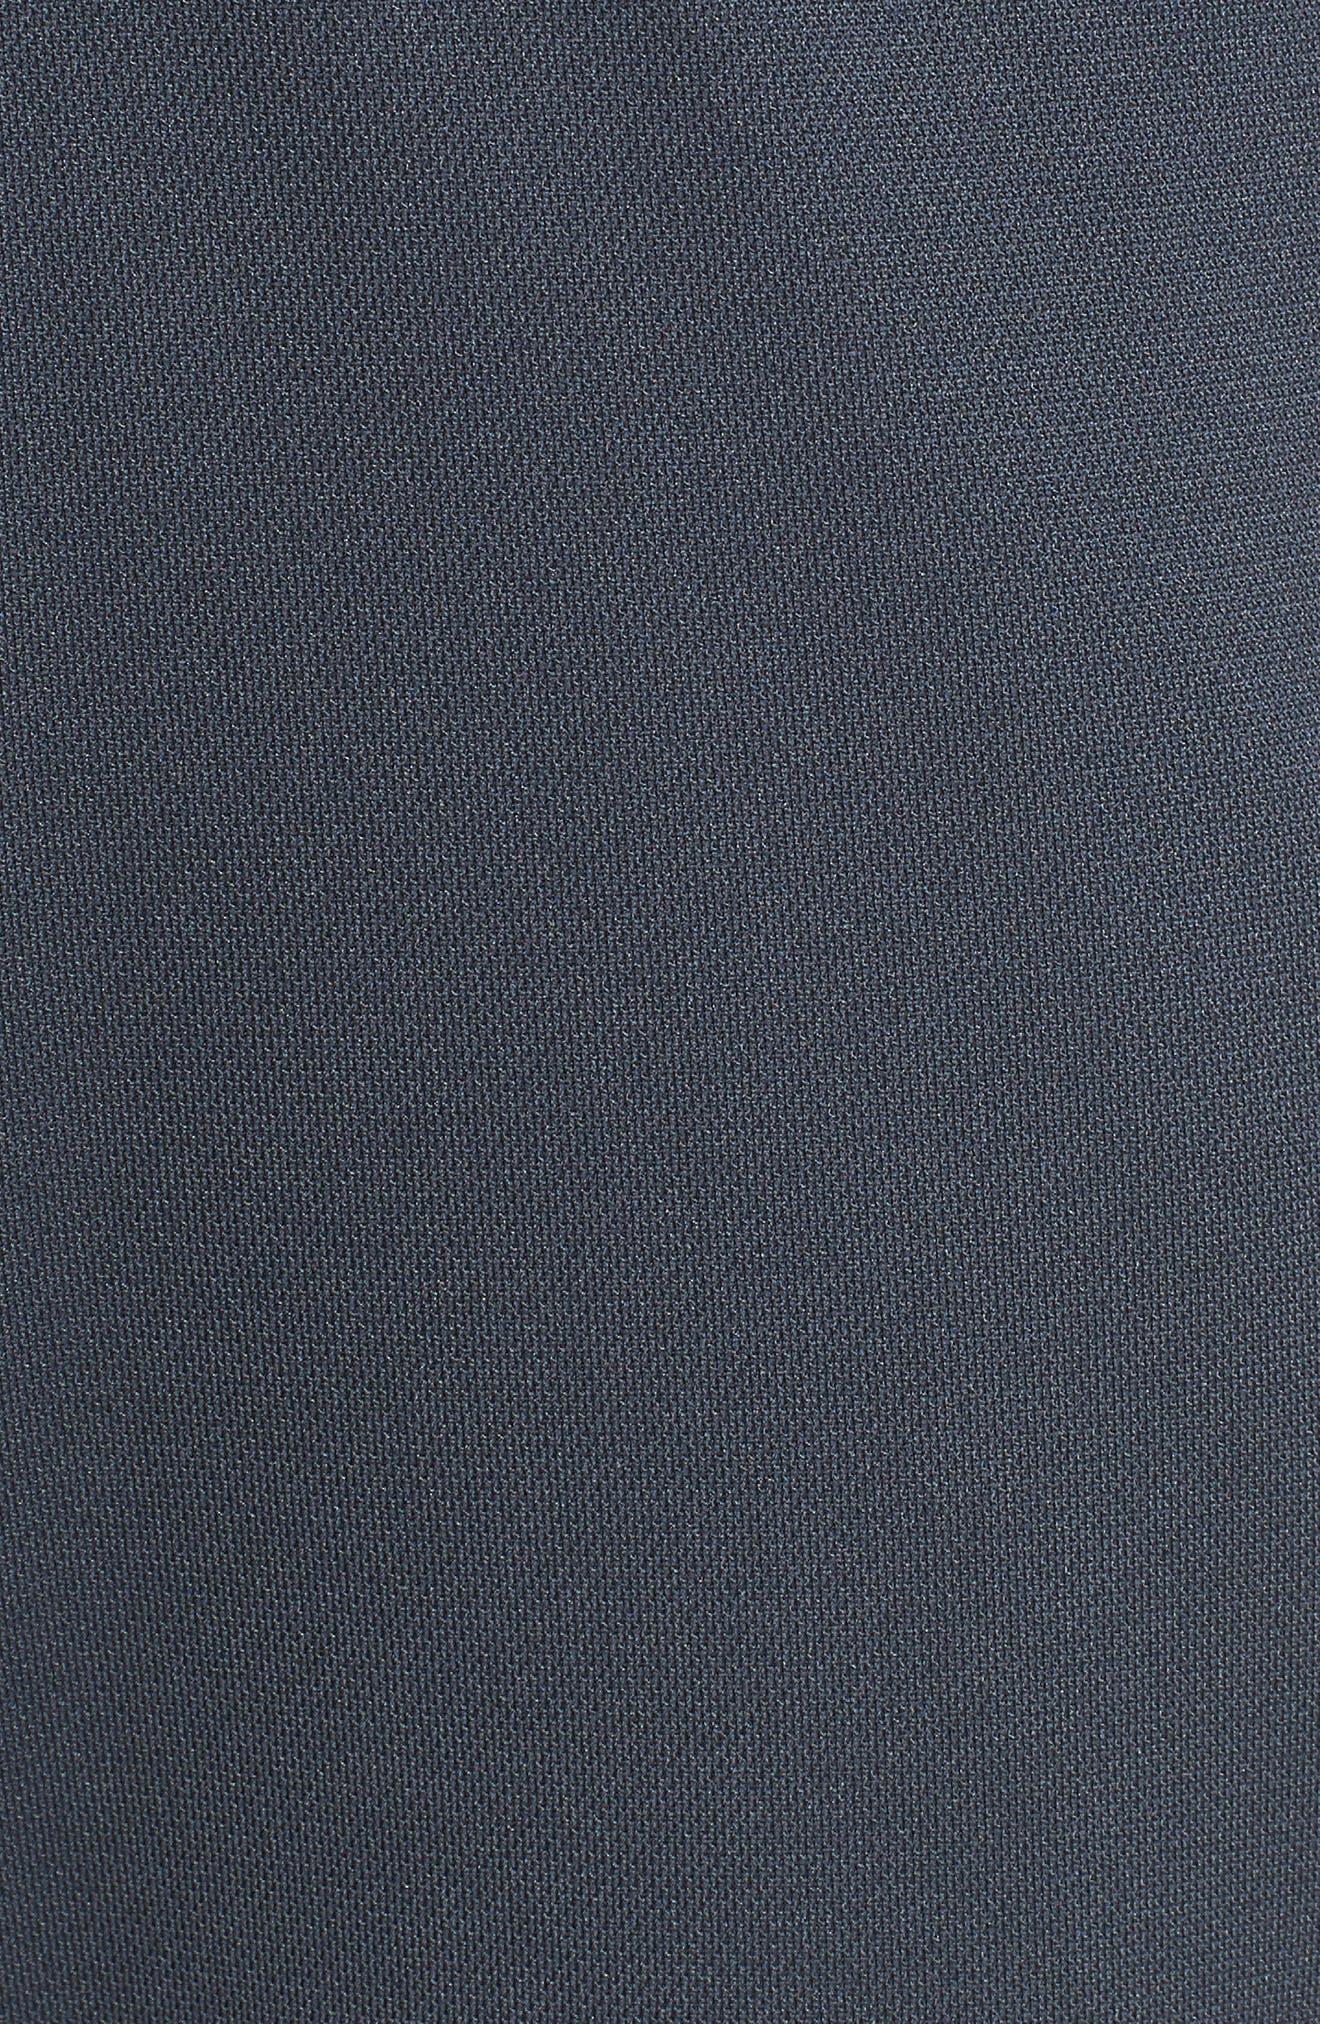 Sportstyle Slim Piqué Track Pants,                             Alternate thumbnail 5, color,                             STEALTH GRAY / / WHITE